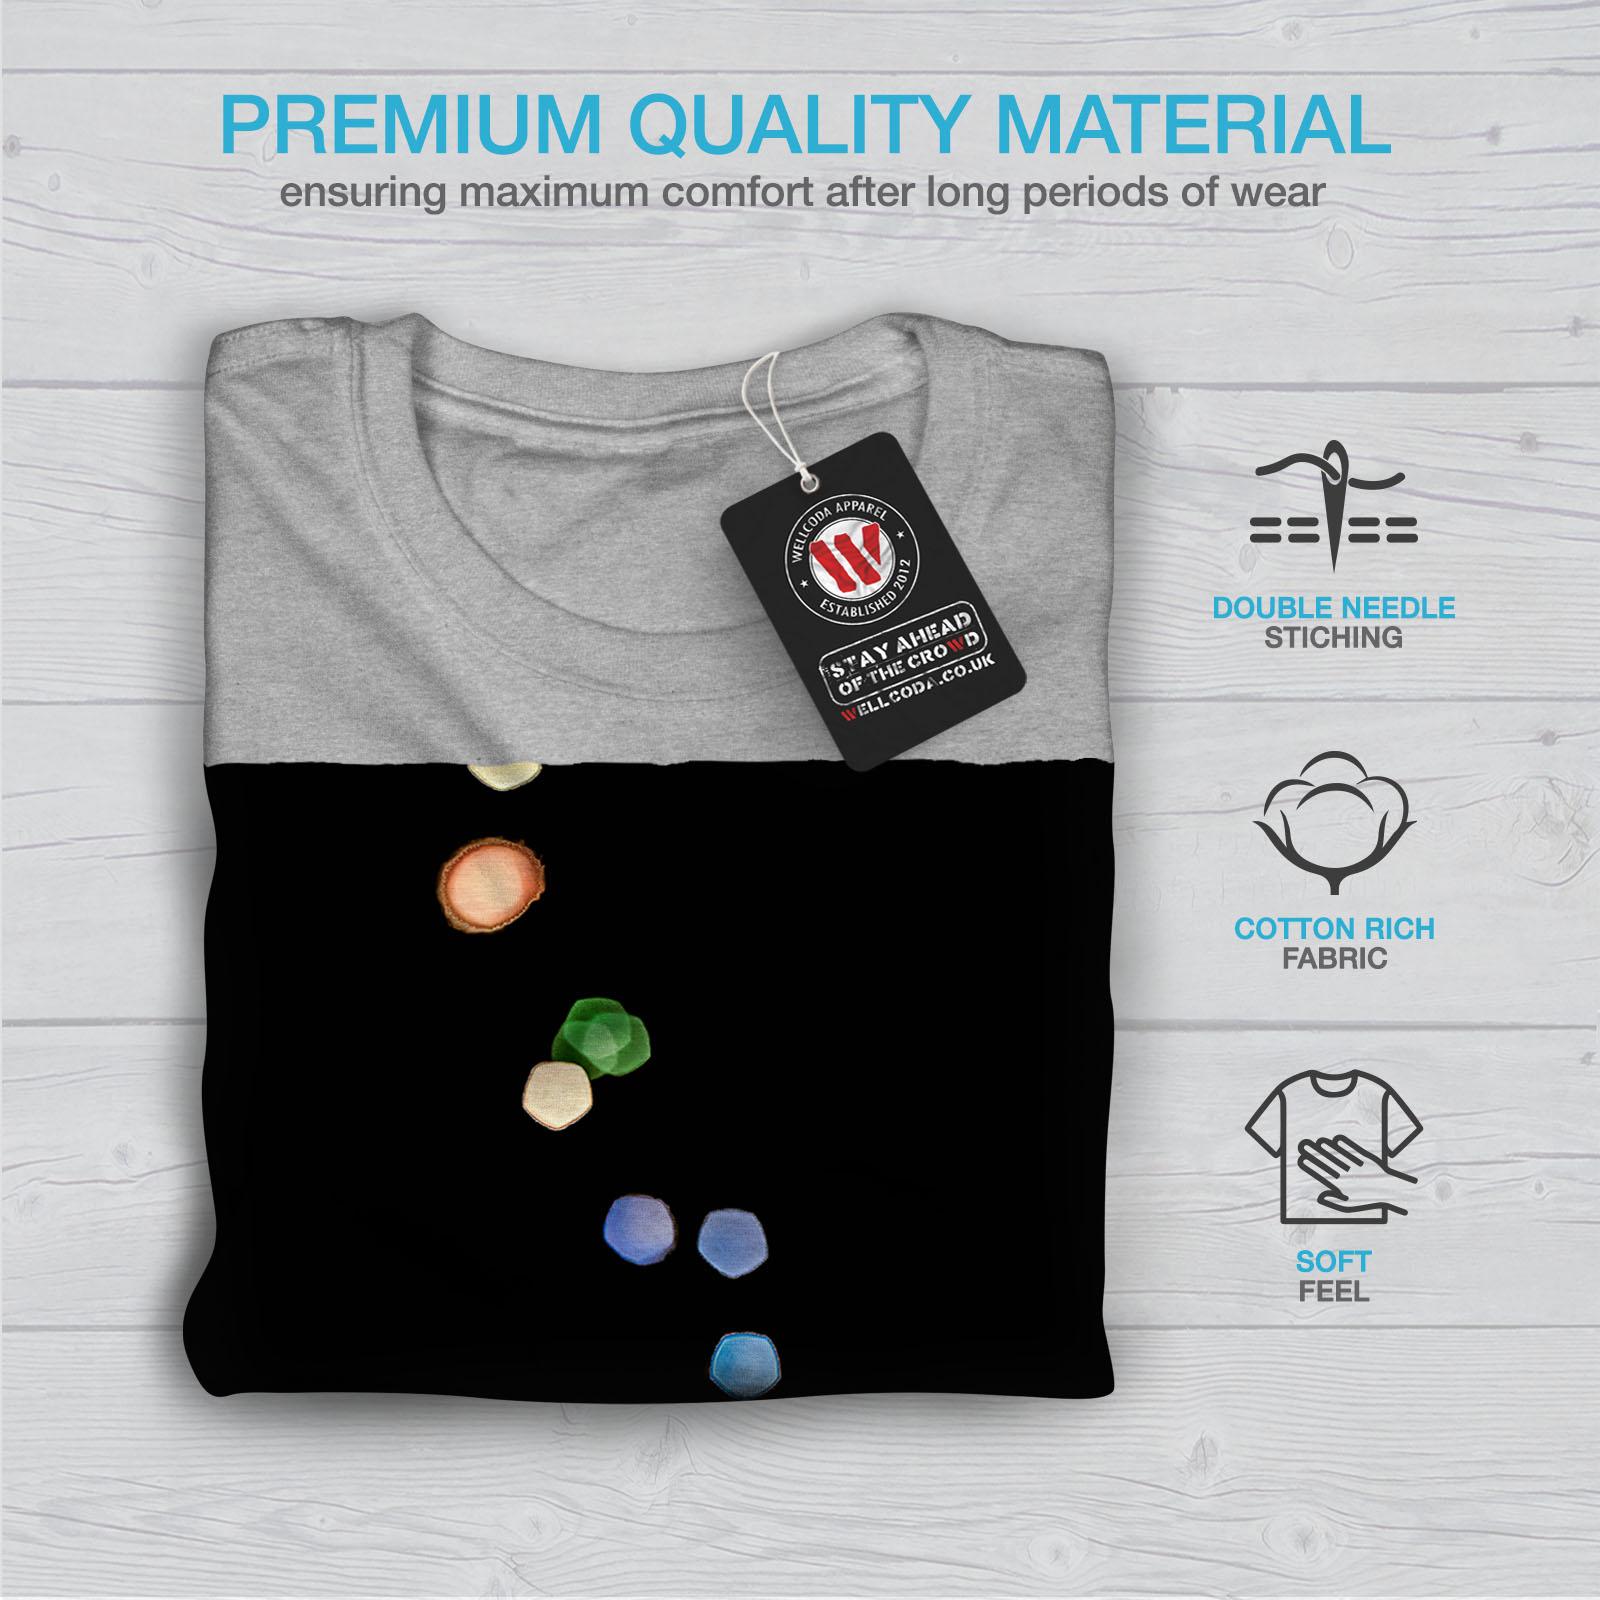 Wellcoda-Tea-Cup-Retro-Old-Mens-T-shirt-Smell-Graphic-Design-Printed-Tee thumbnail 19